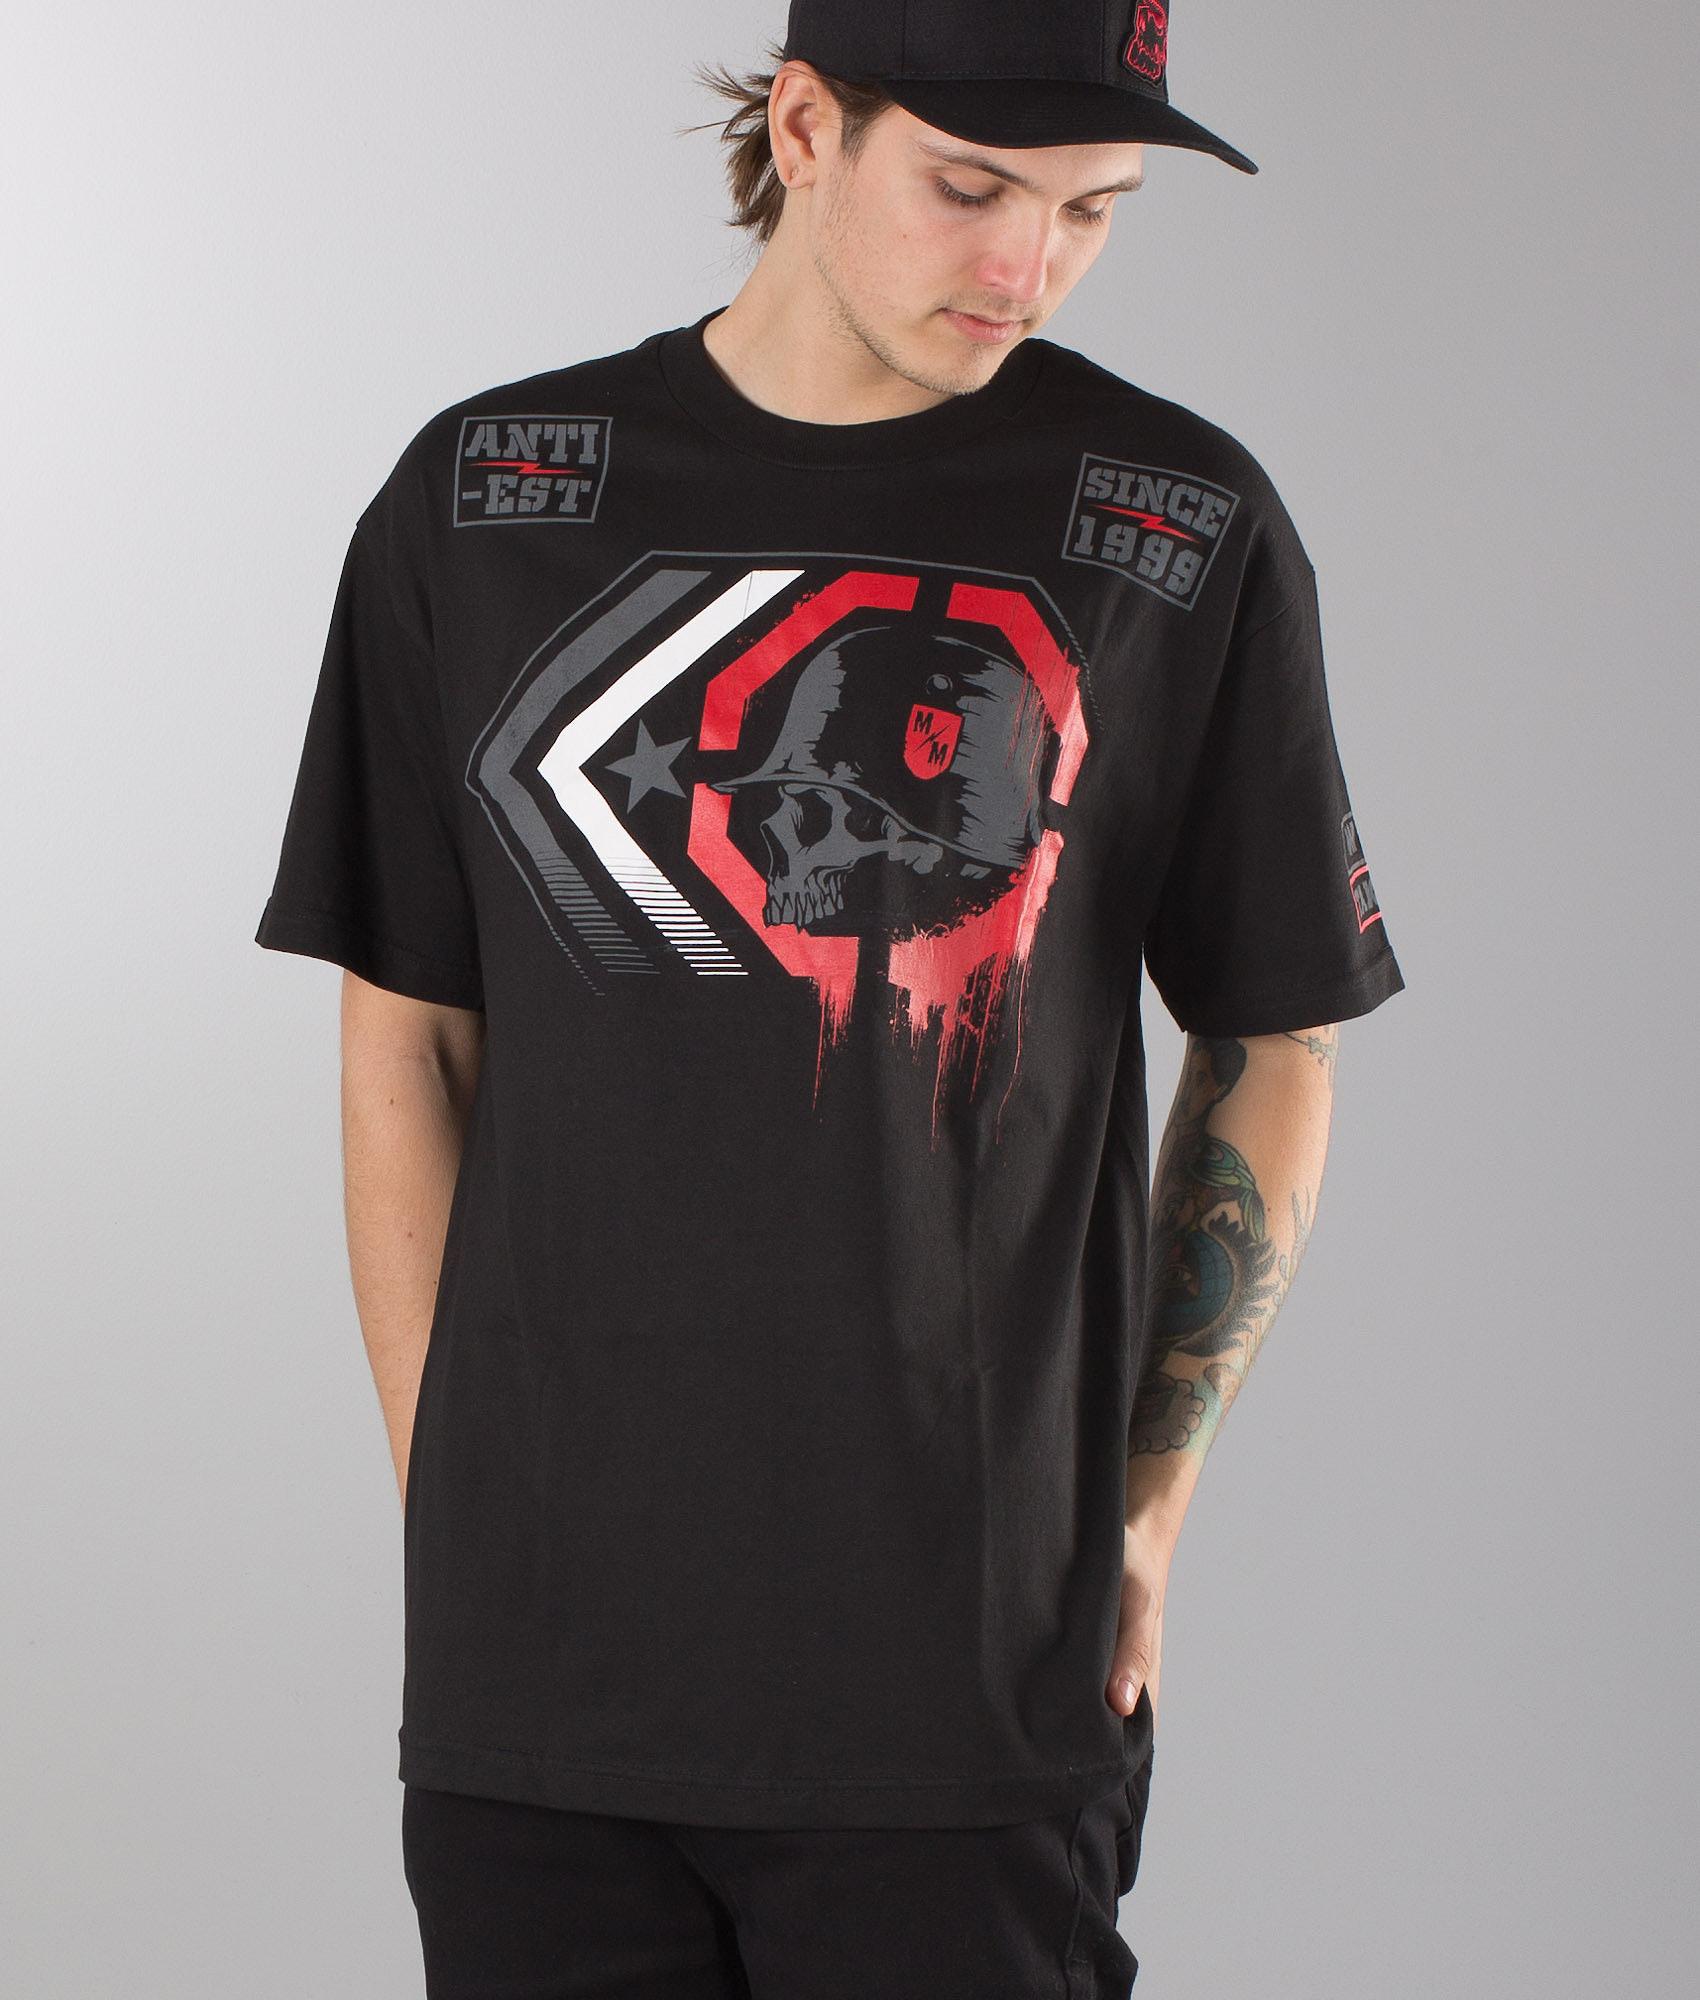 Metal Mulisha Shatter T-shirt Black - Ridestore com